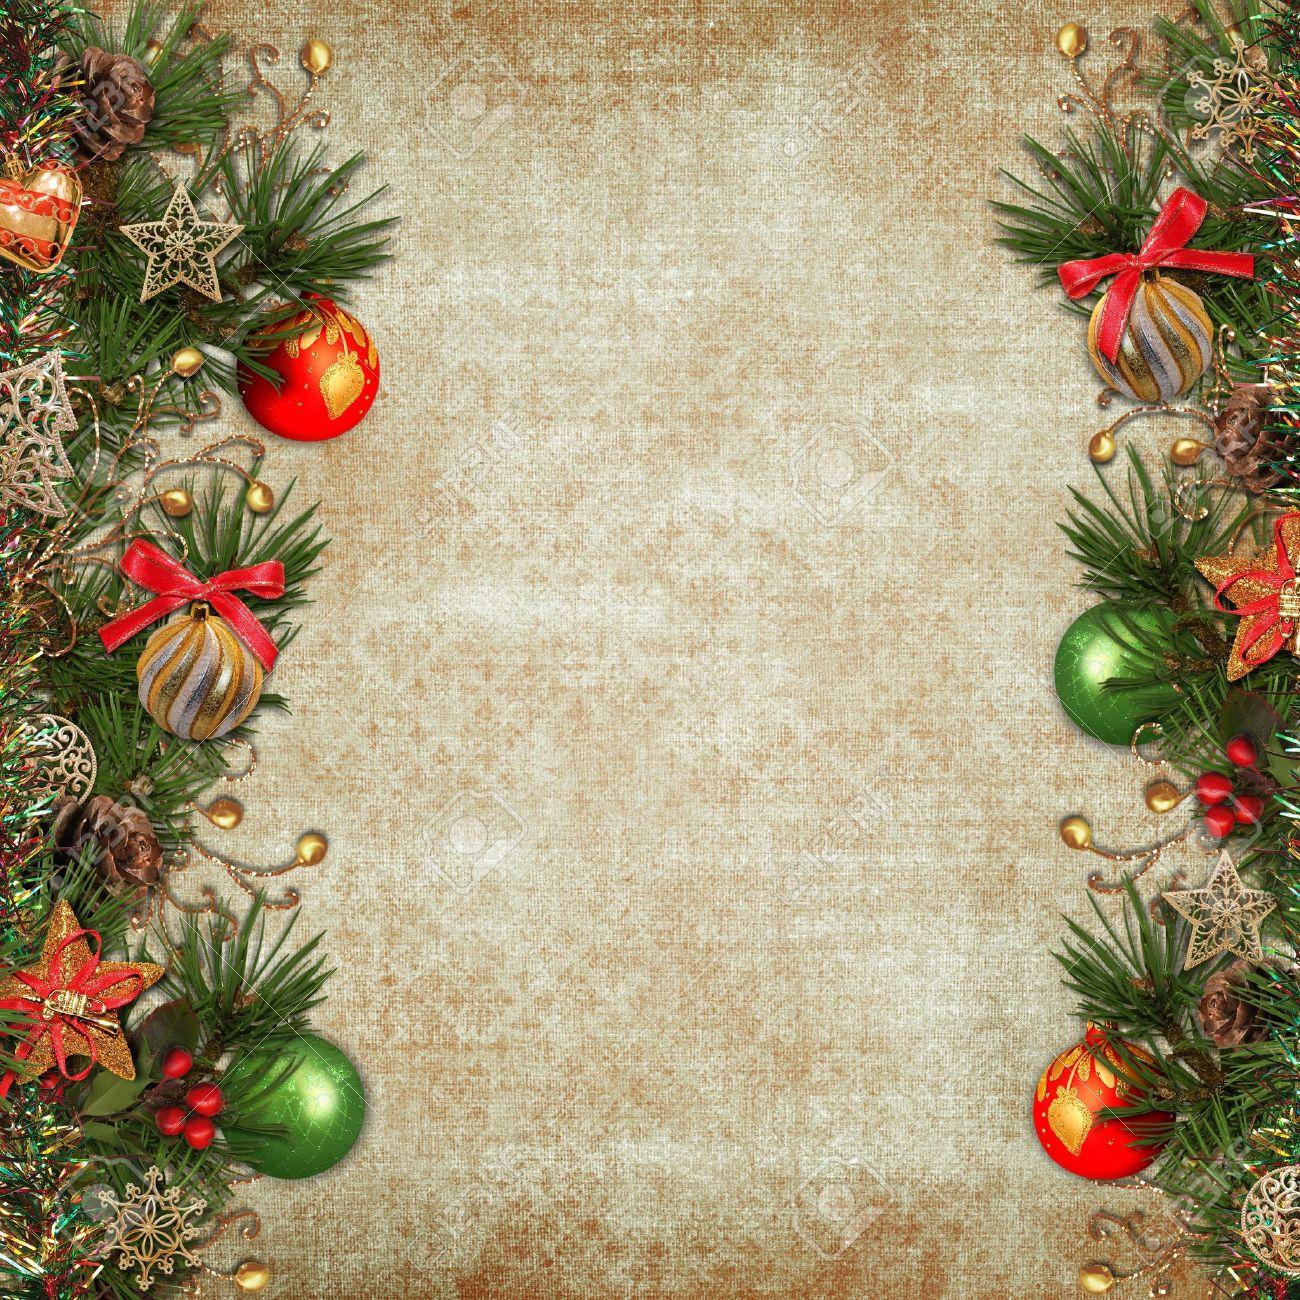 Free Christmas Background.Vintage Christmas Background